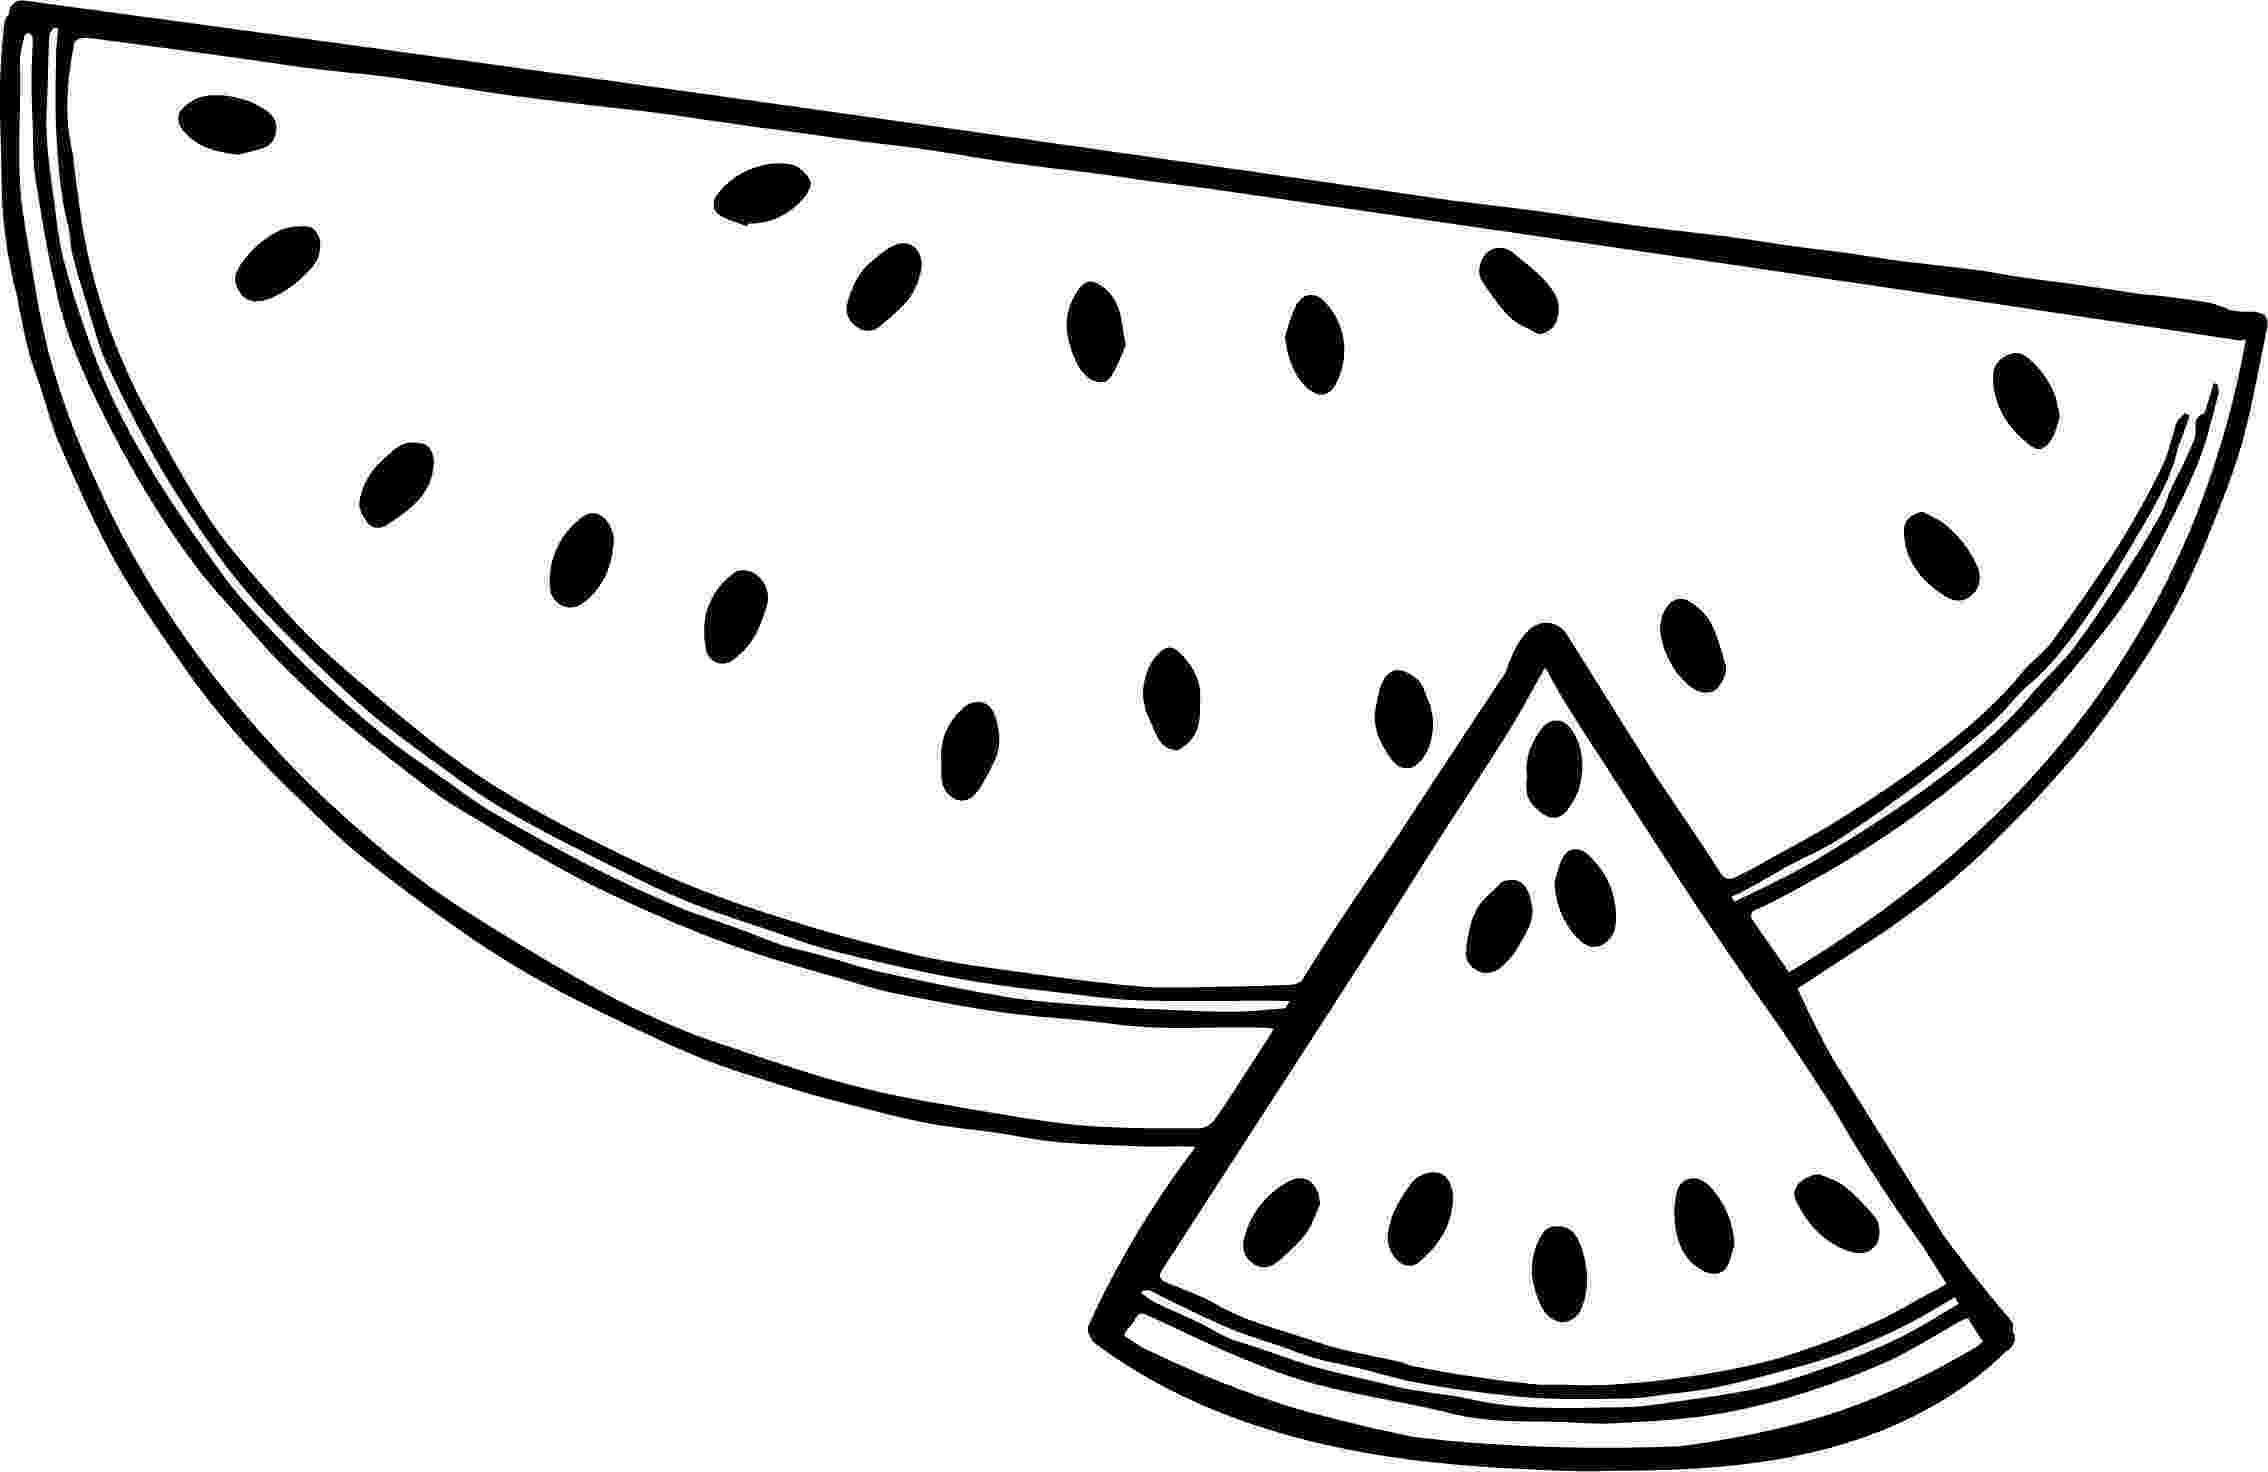 watermelon coloring sheets watermelon coloring pages getcoloringpagescom coloring sheets watermelon